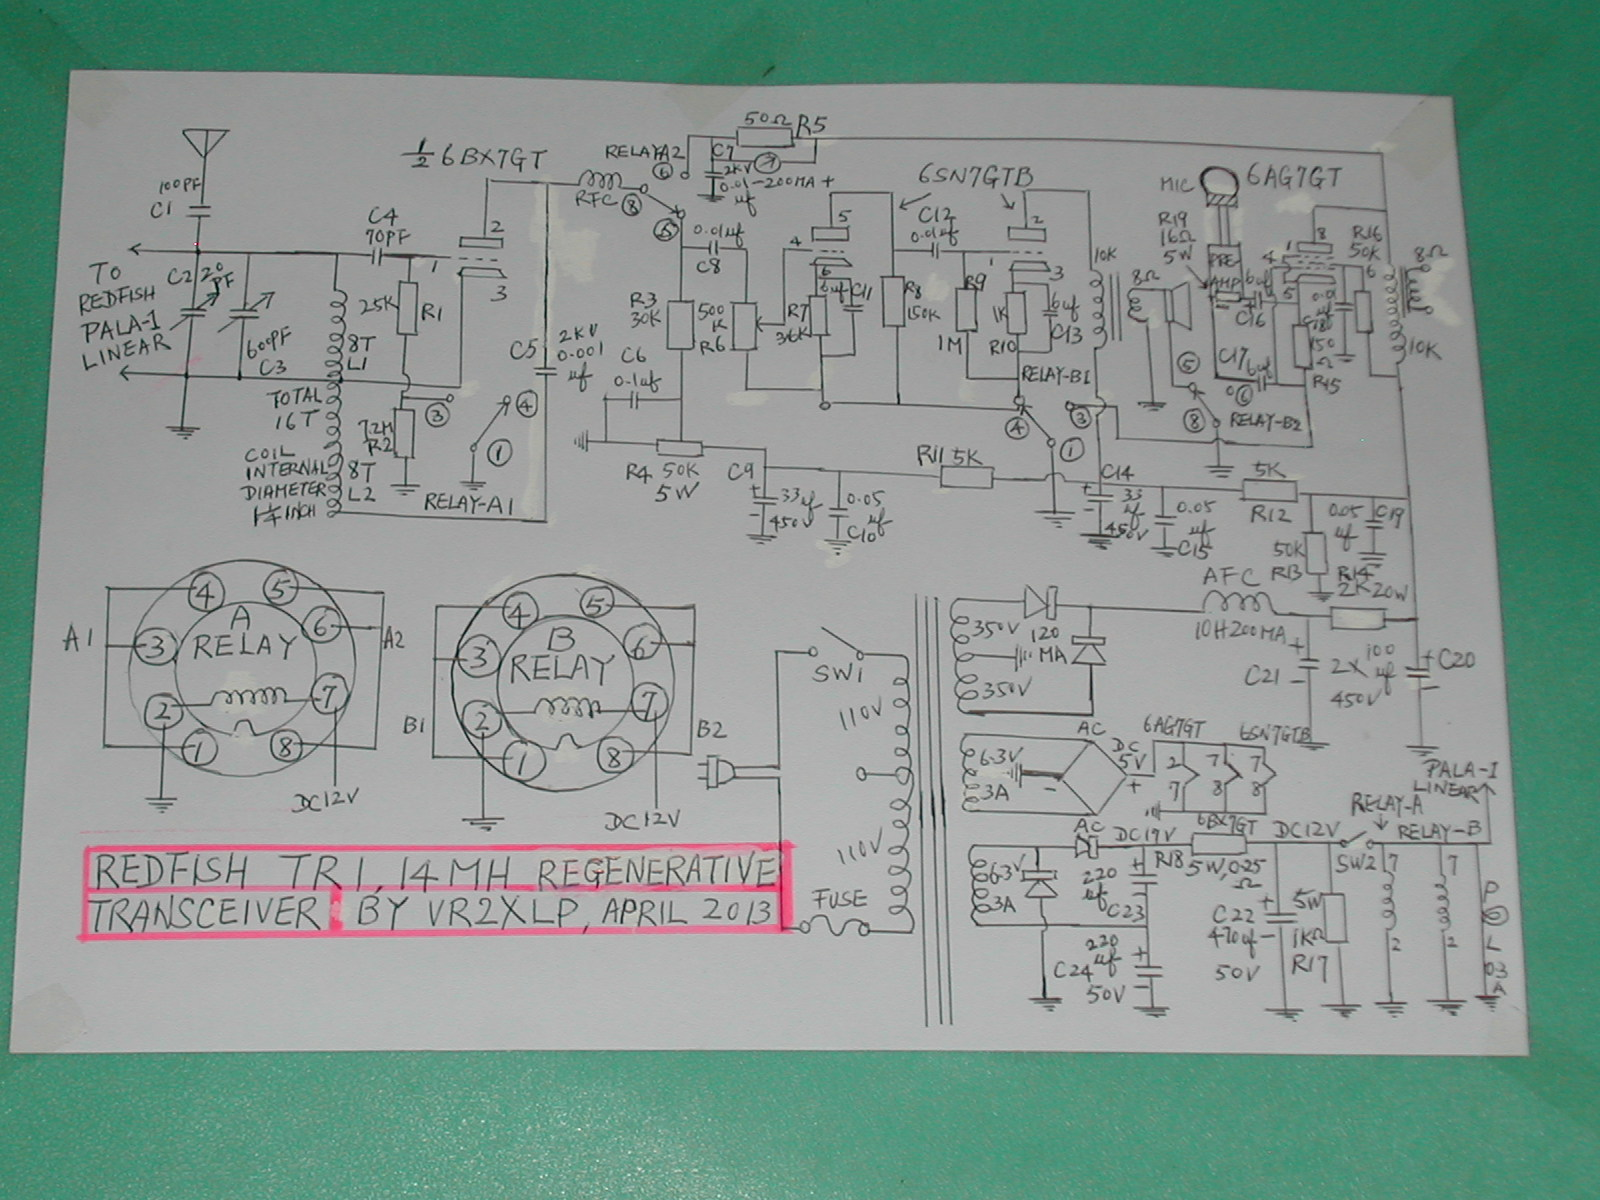 Resistor Schematic Symbols R1 Is An Americanstyle 1k Resistor